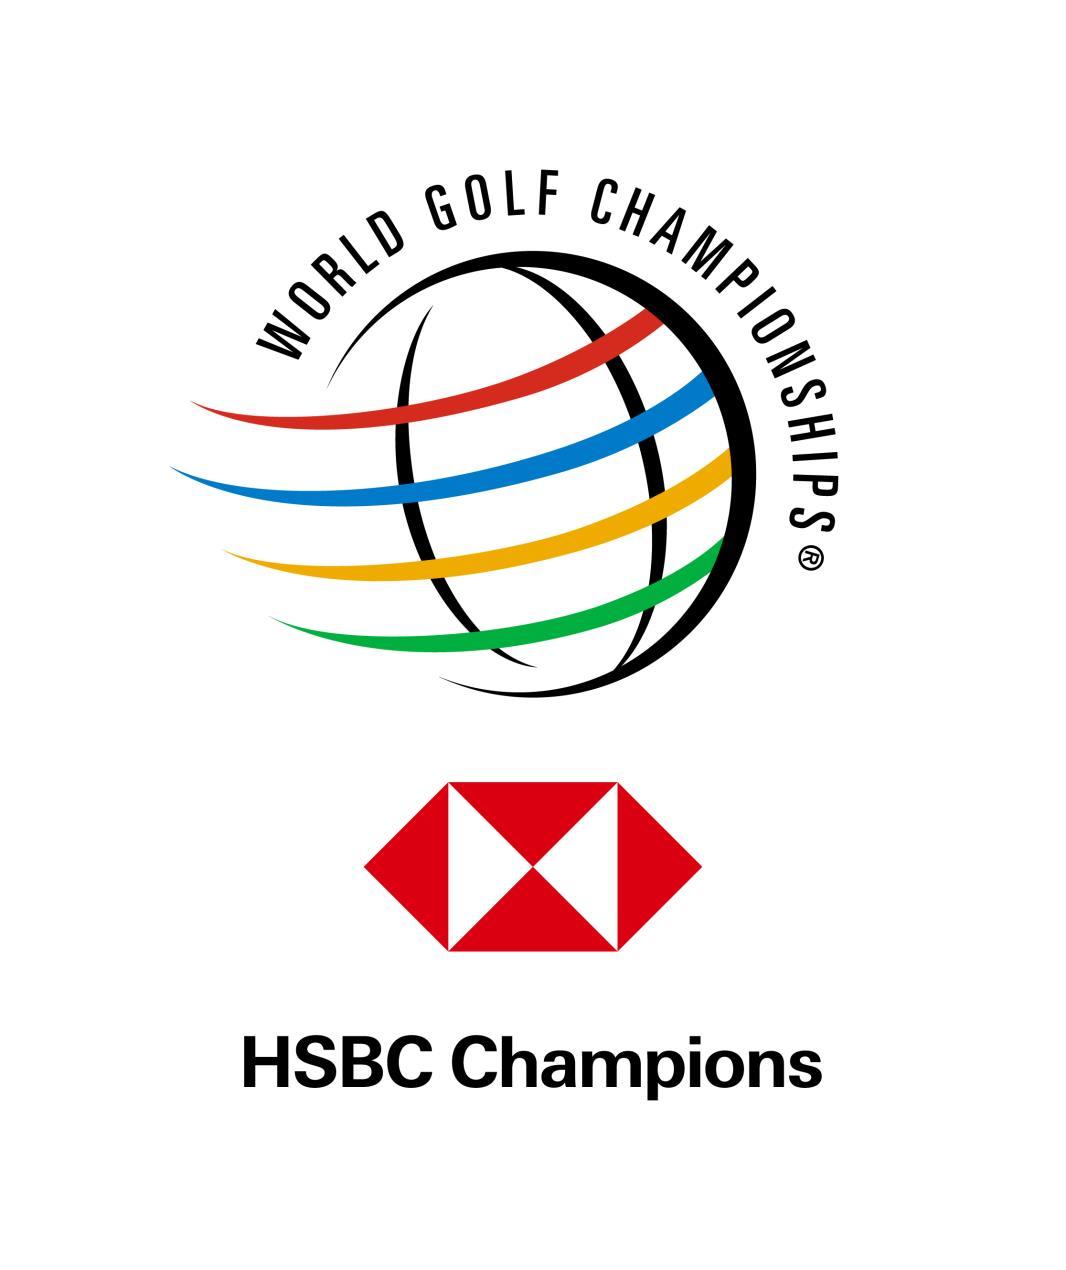 HSBC WGC Champions